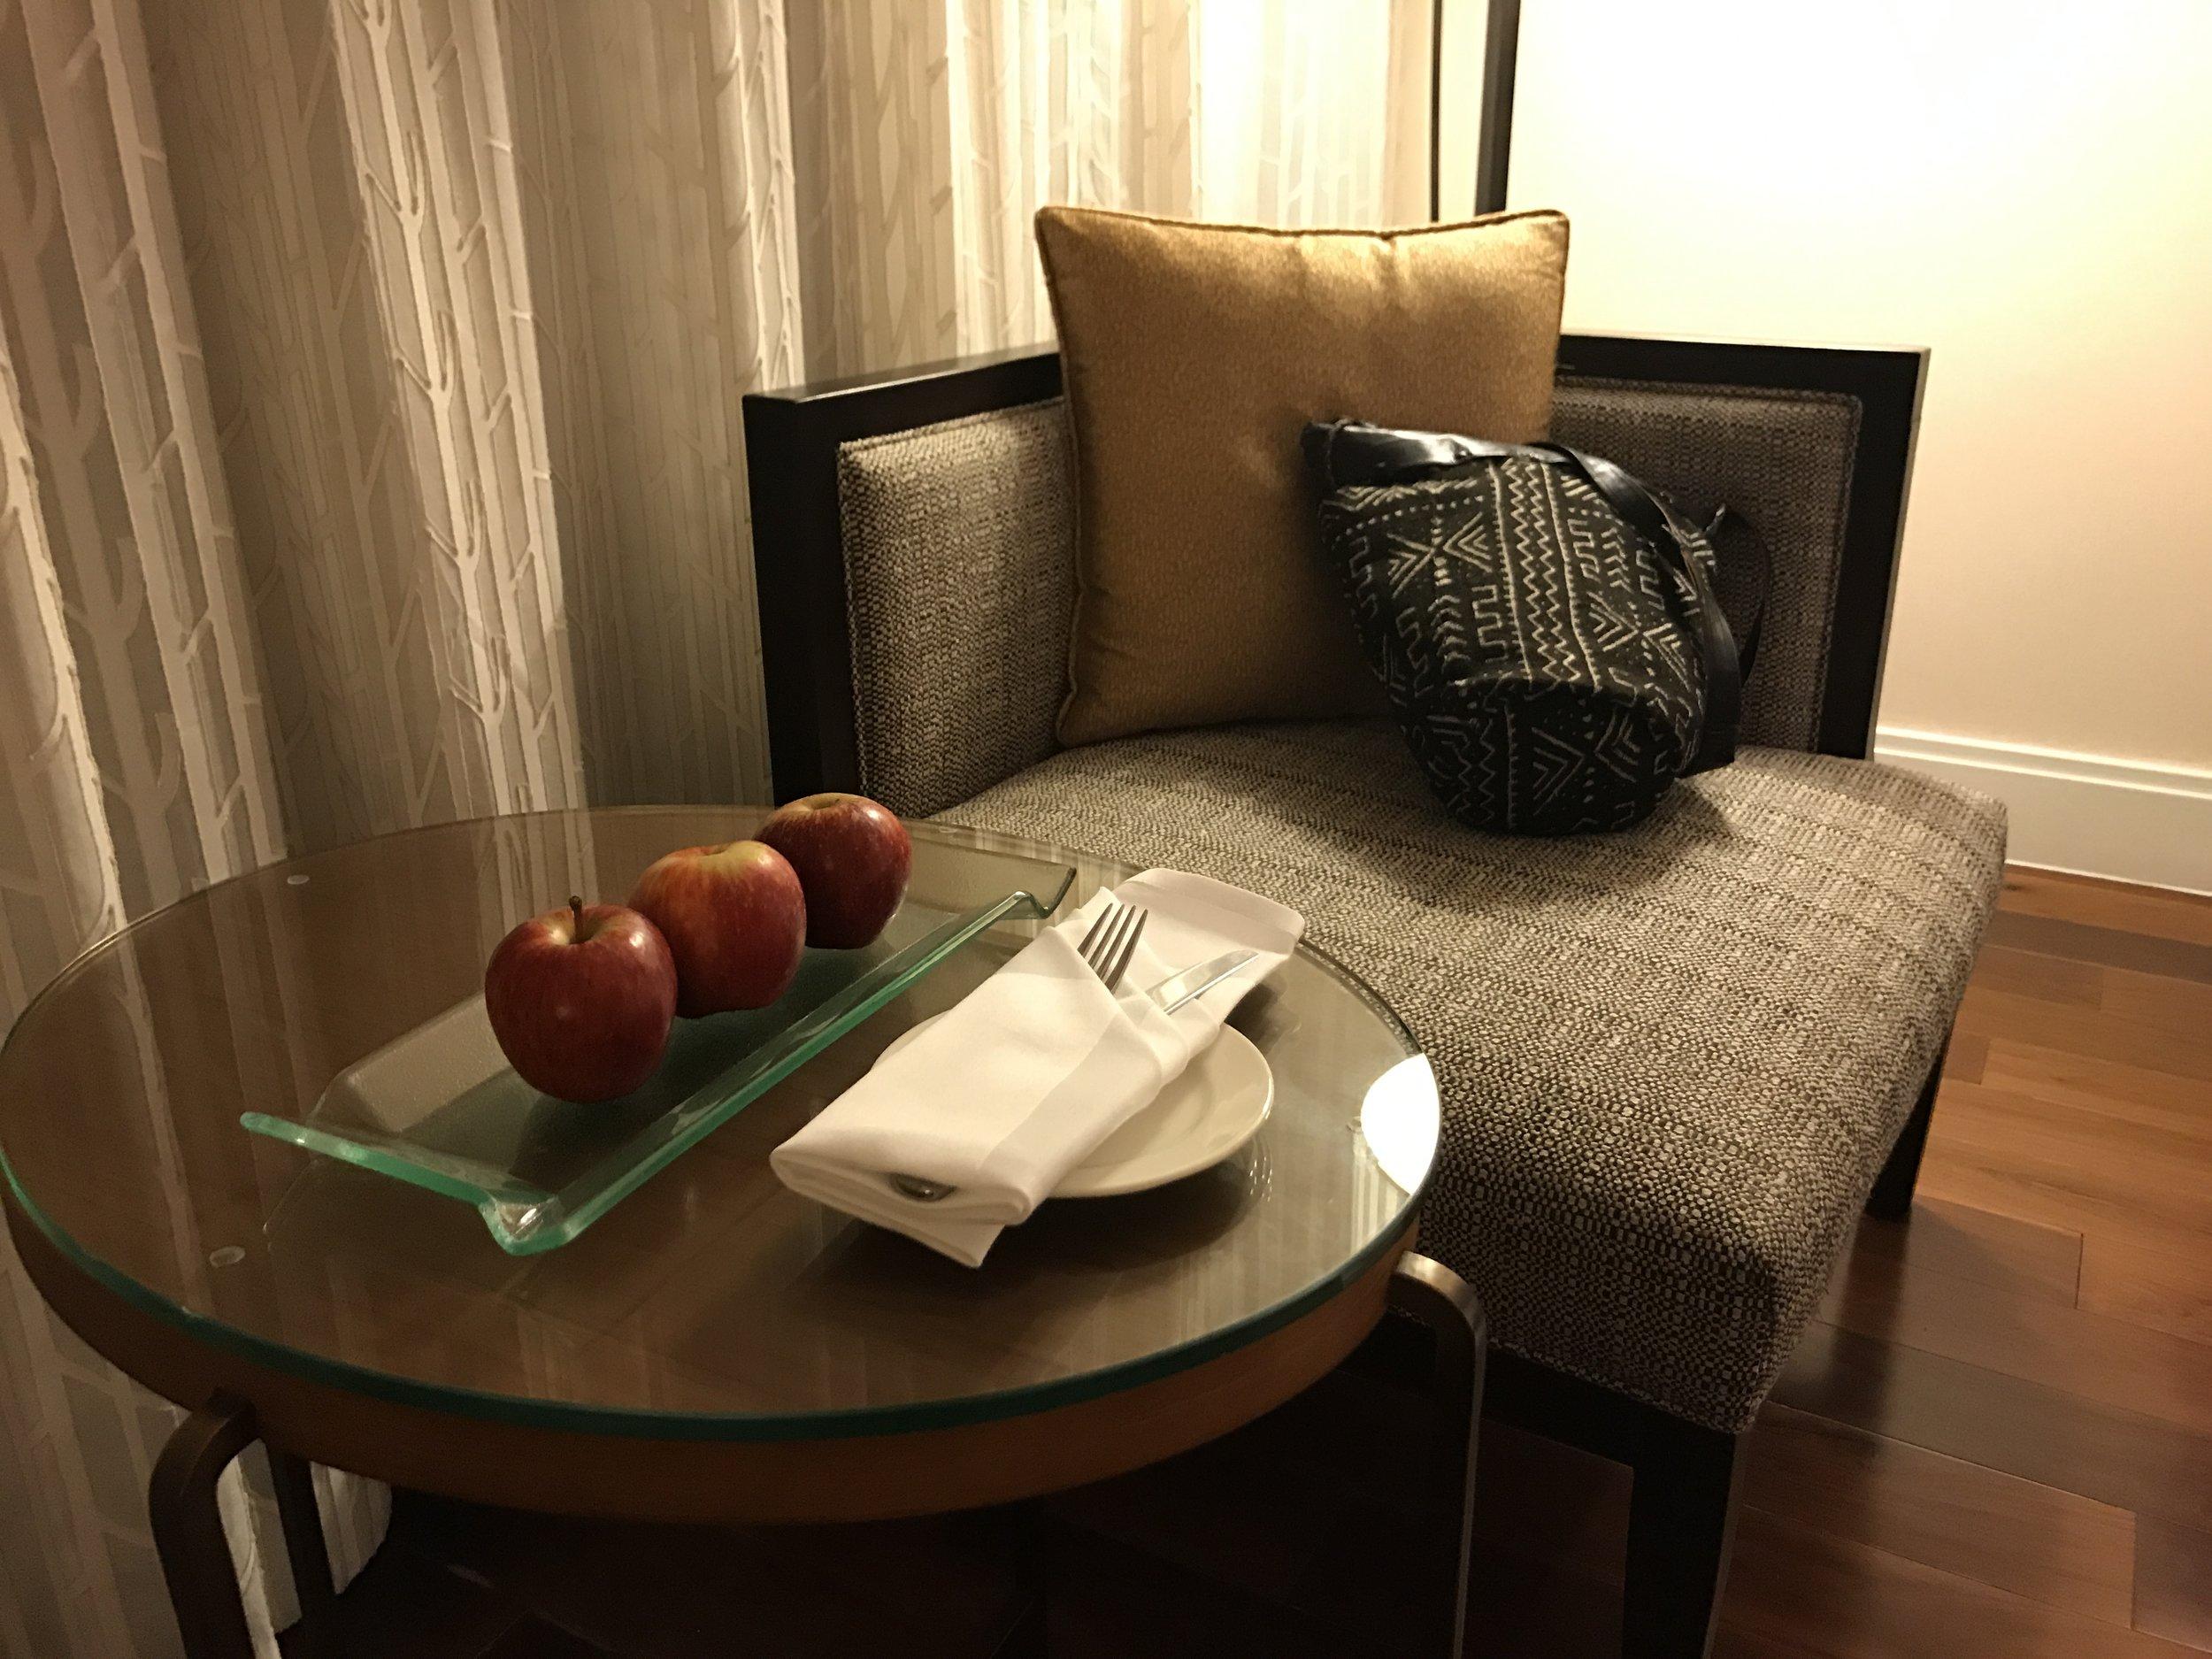 Kempinski-Goldcoast-Accra-Hotel-Review-Photos-vickieremoeofficial3.JPG